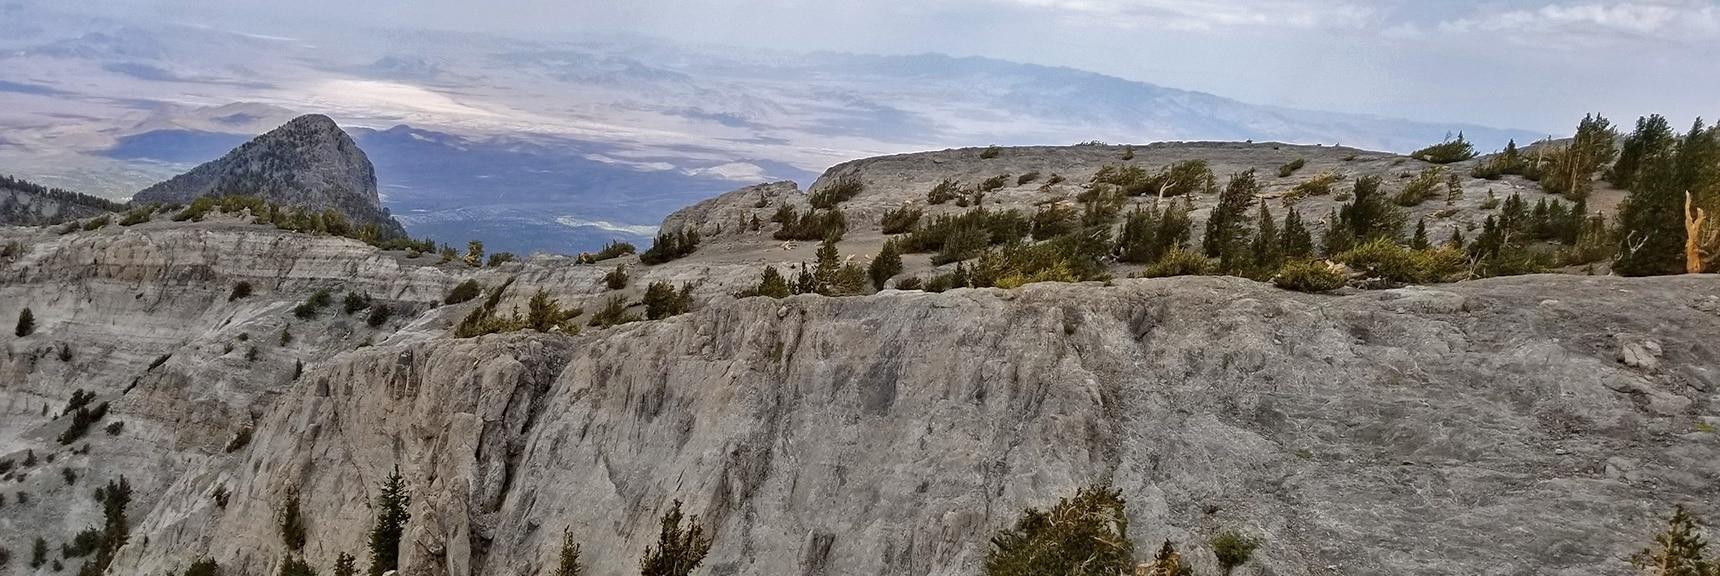 Mummy's Neck Spur Toward Mummy's Head Viewed from the West   Mummy Mountain Northern Rim Overlook, Spring Mountain Wilderness, Nevada